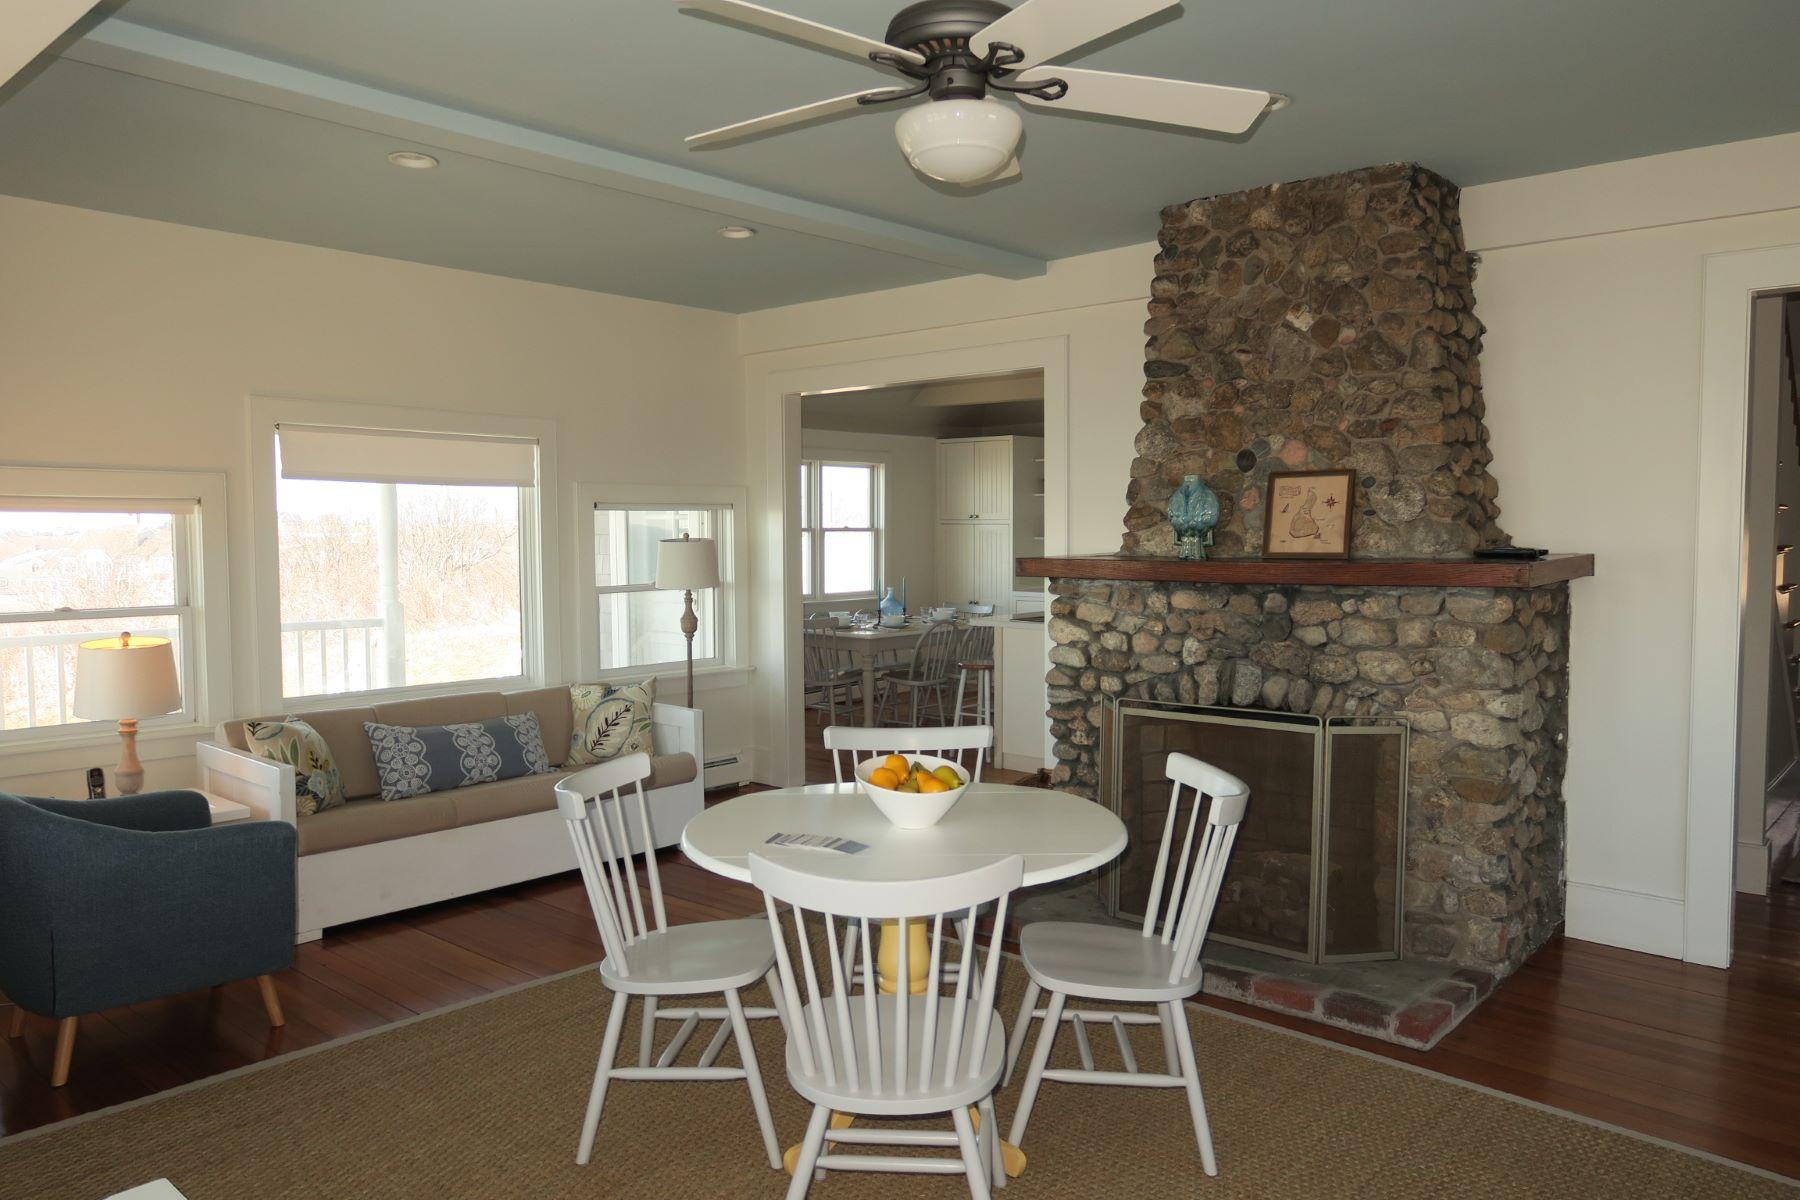 Additional photo for property listing at Mohegan Bluff Drama 800 Mohegan Trail Block Island, Rhode Island 02807 United States